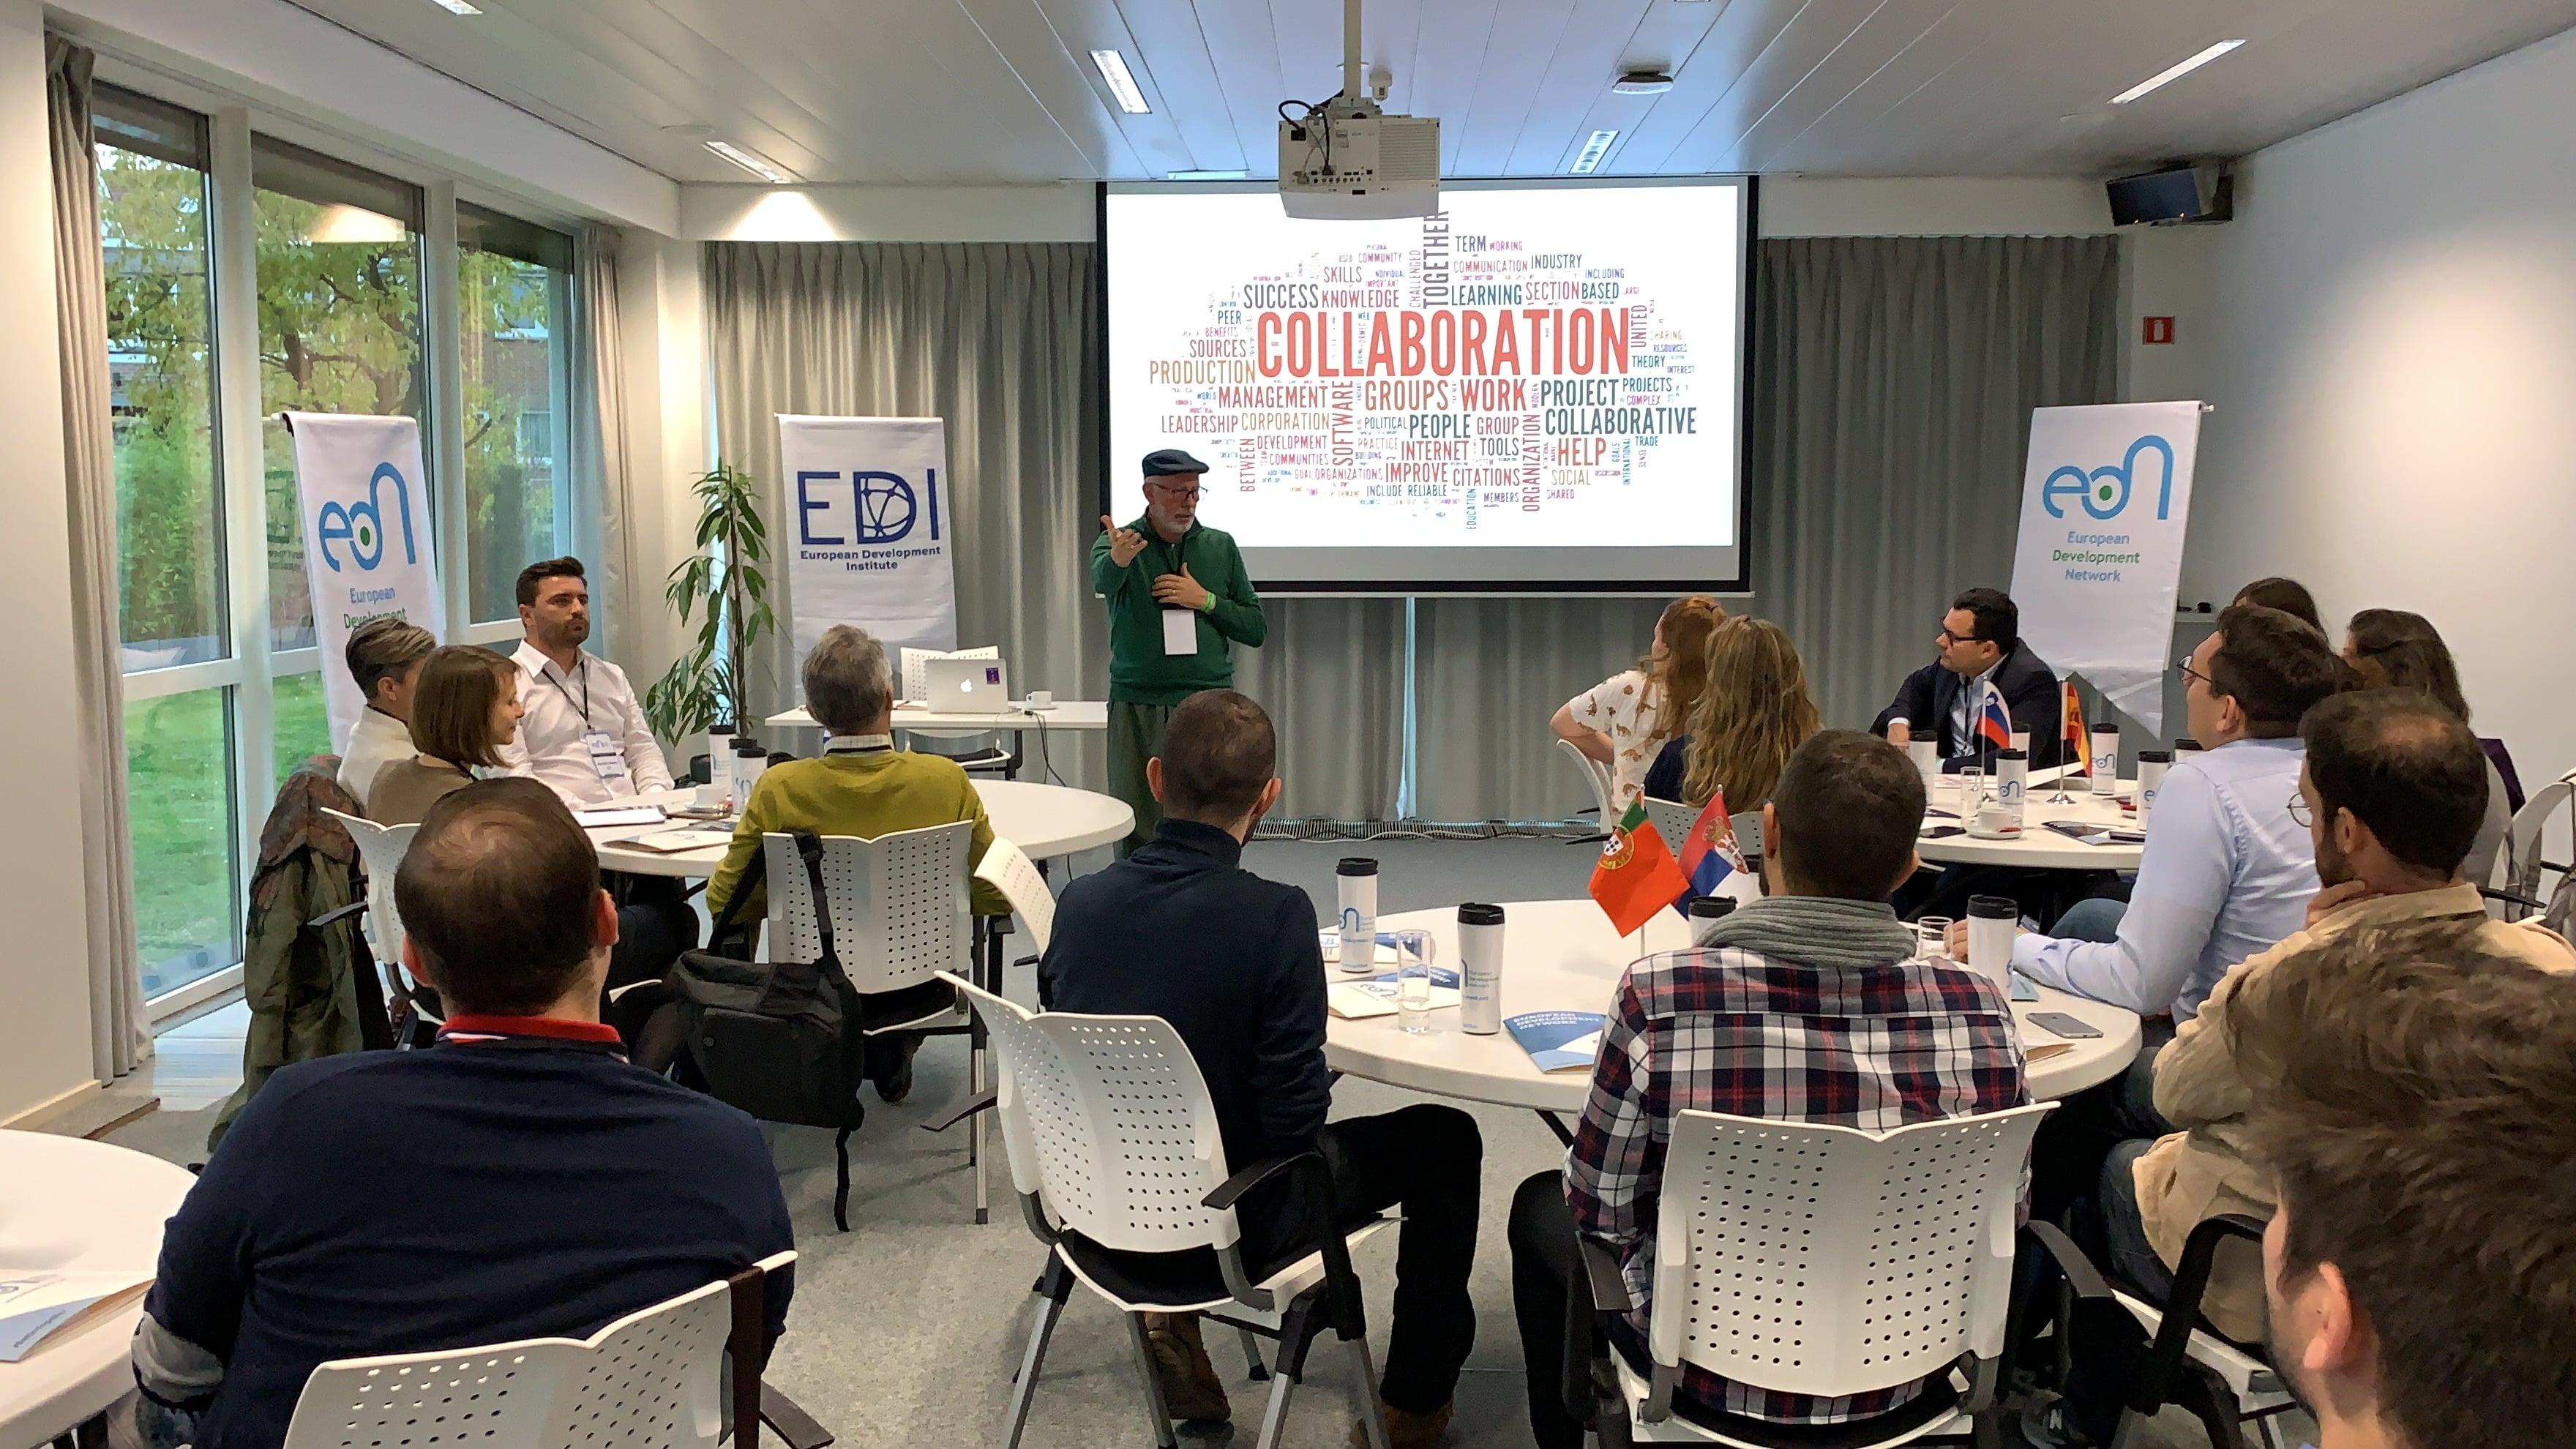 The European Development Network Summit's Projects